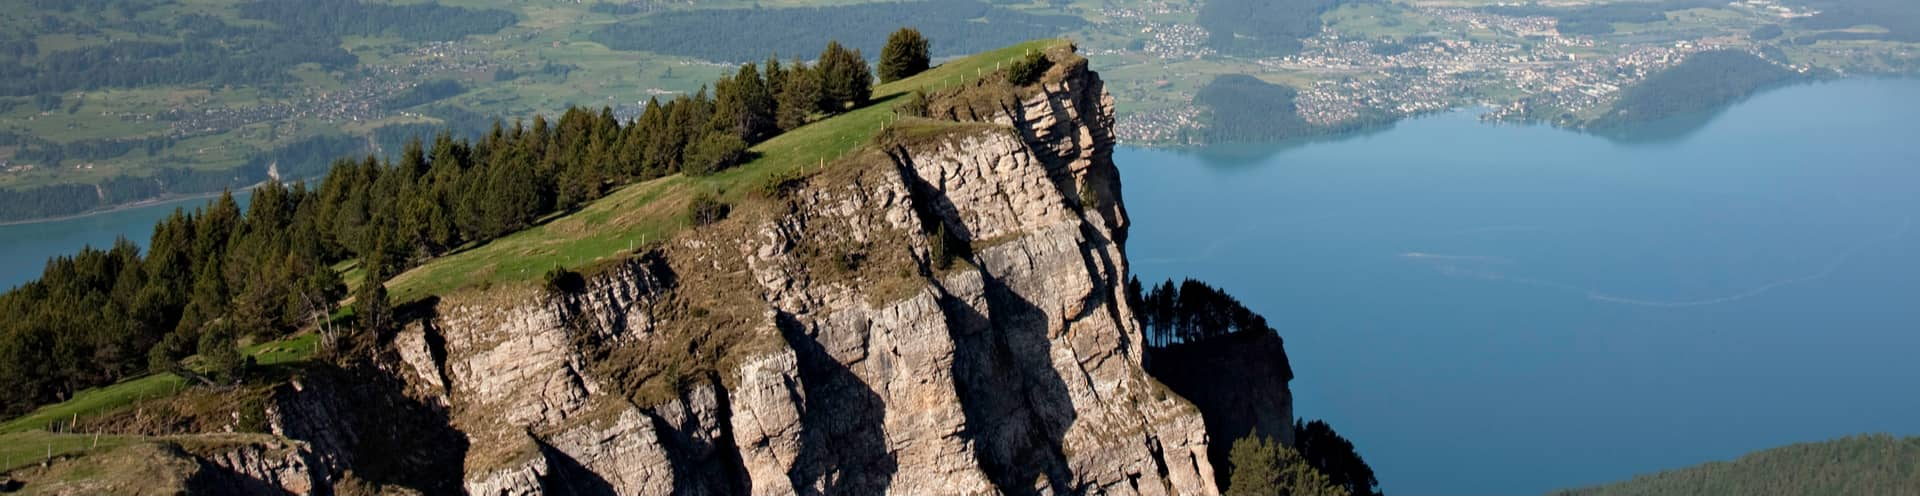 Kamperen in Bern